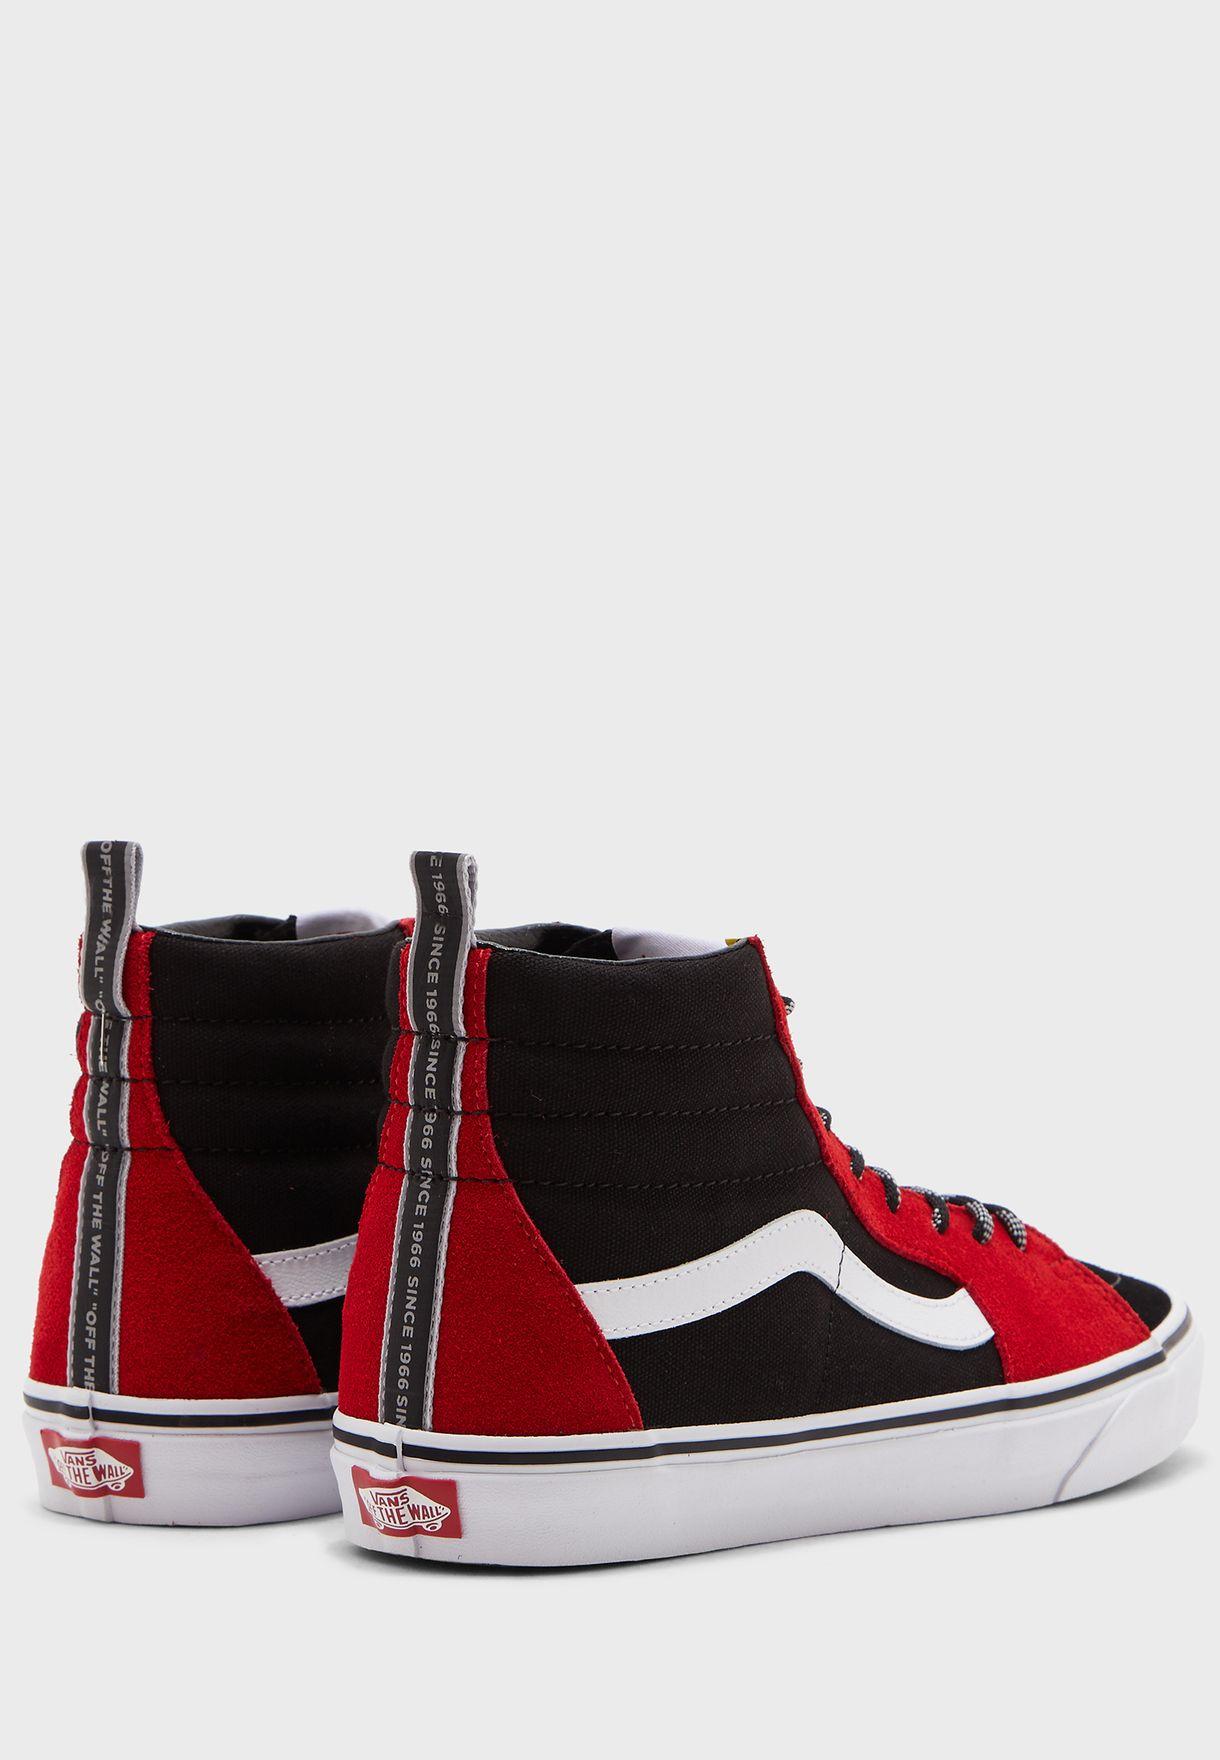 حذاء اس كيه 8 -هاي